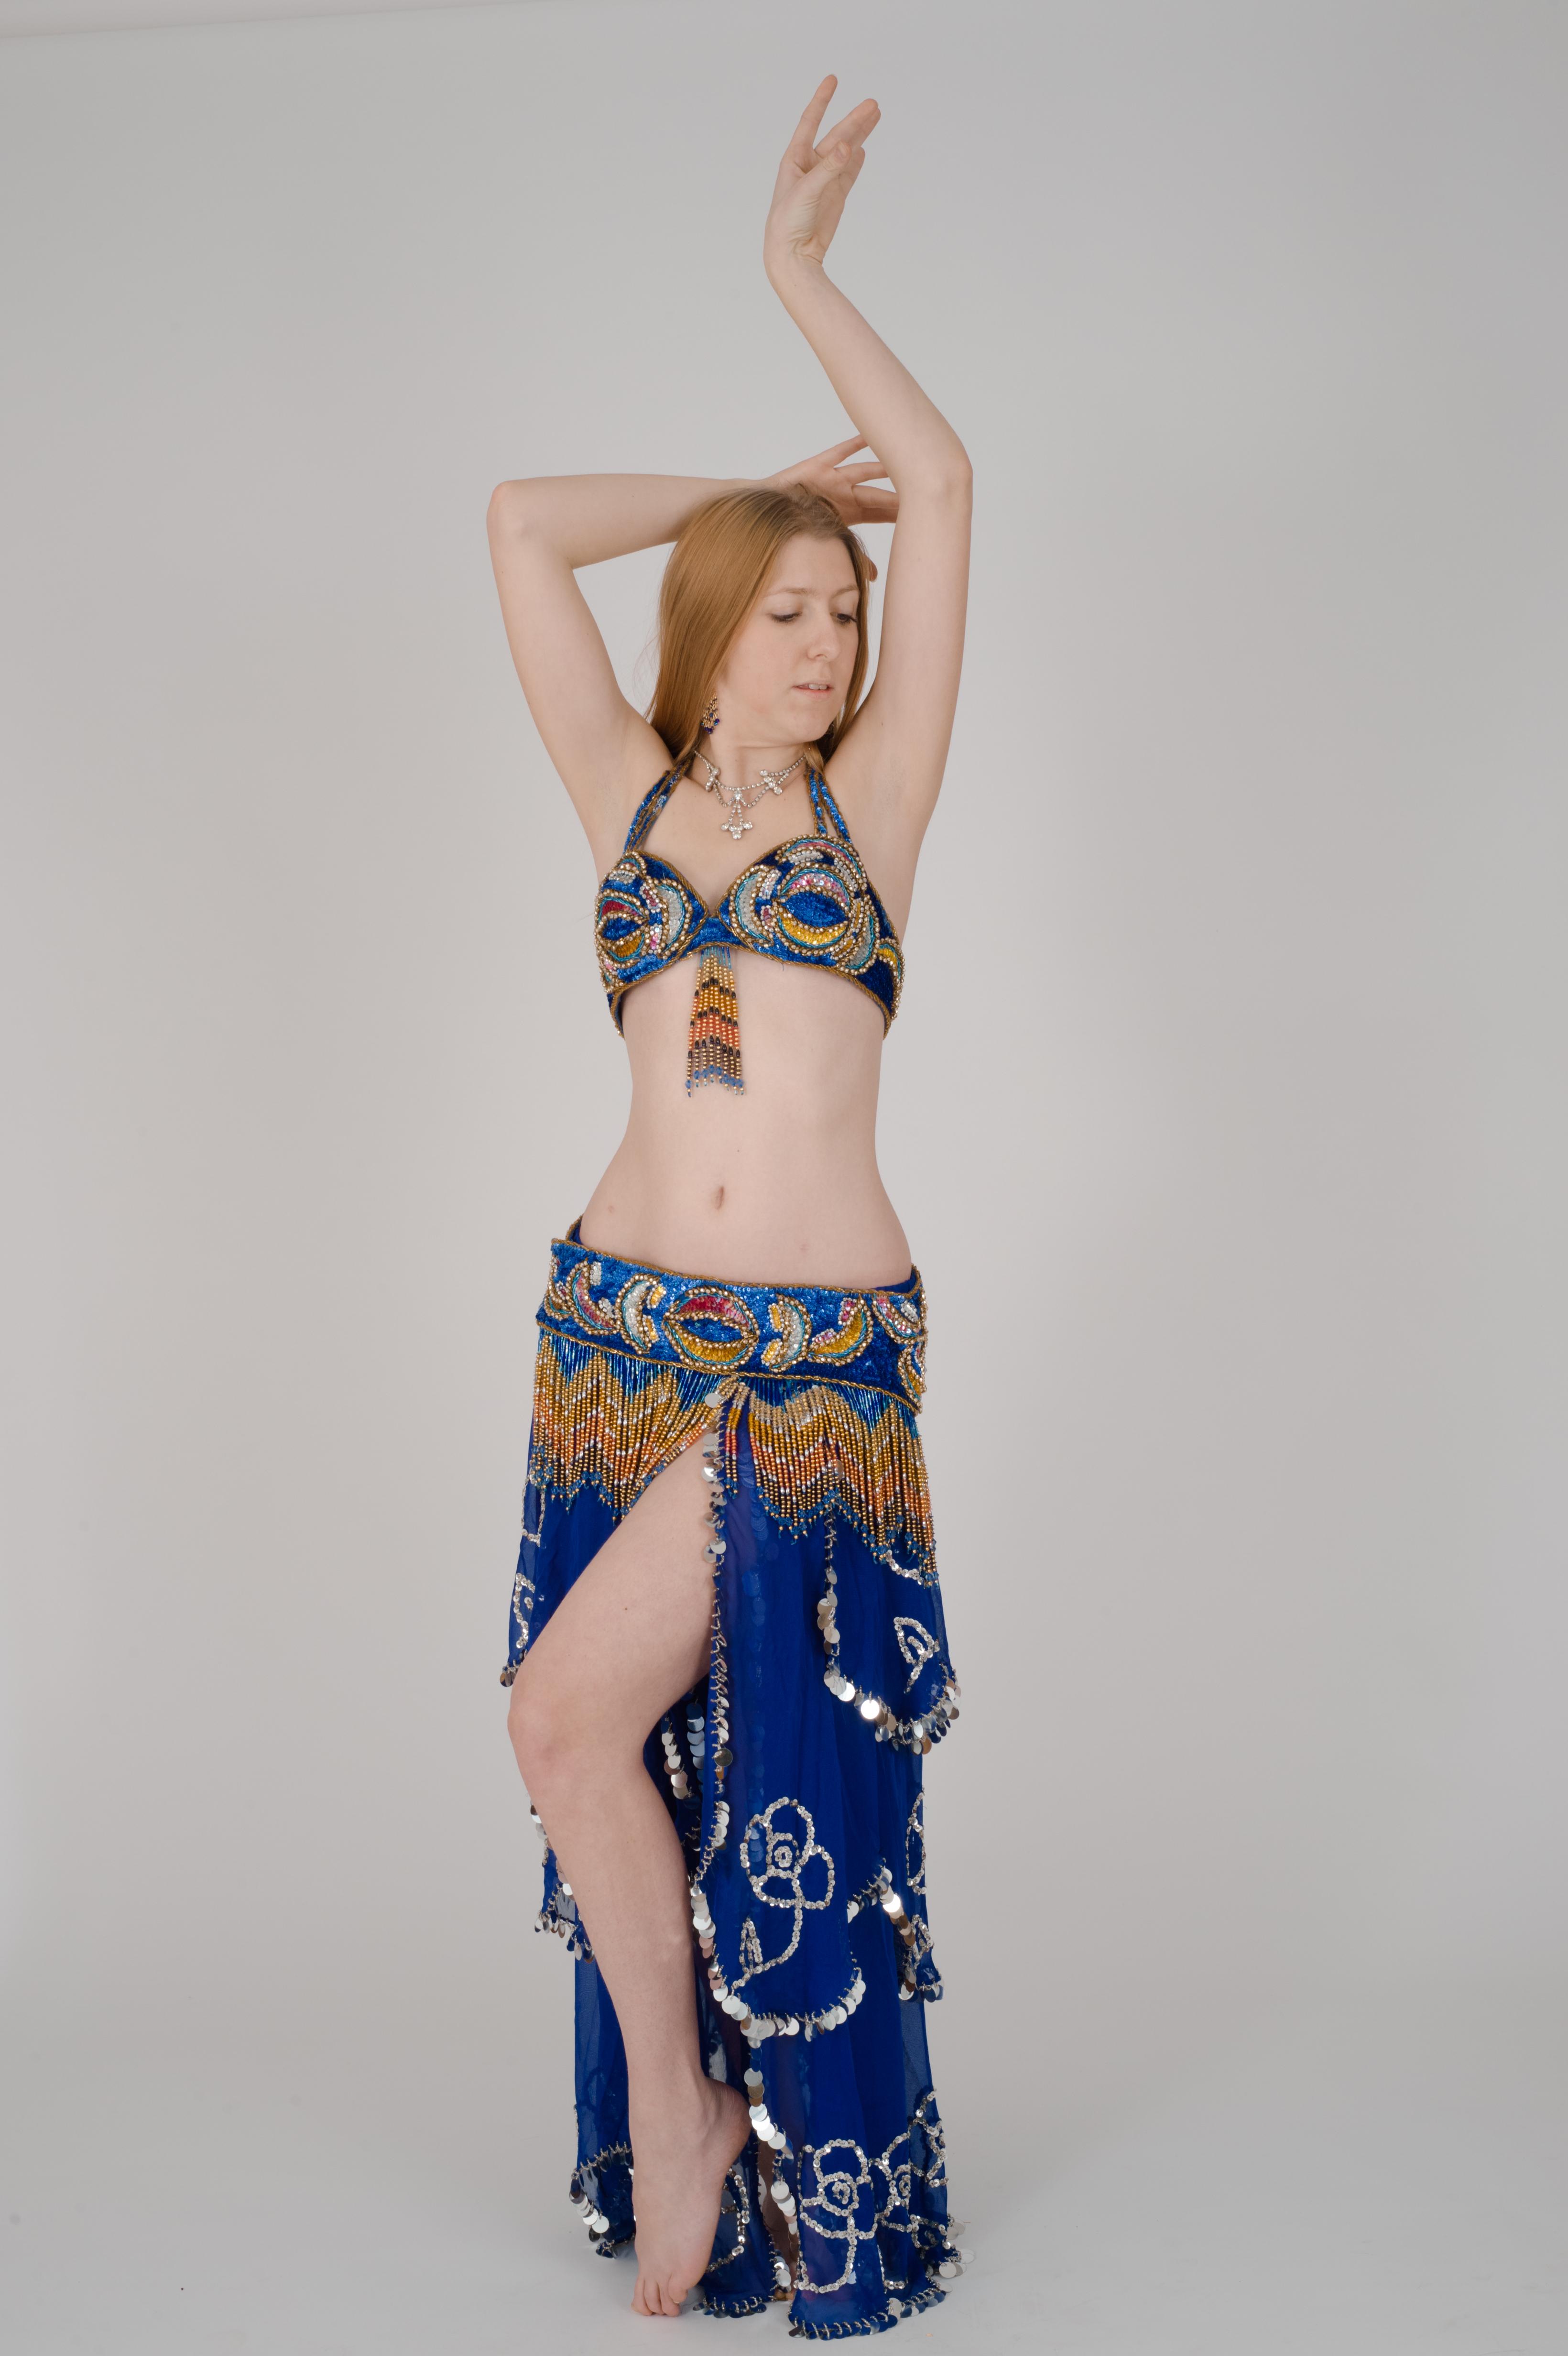 Dancer's Pose by Danika-Stock